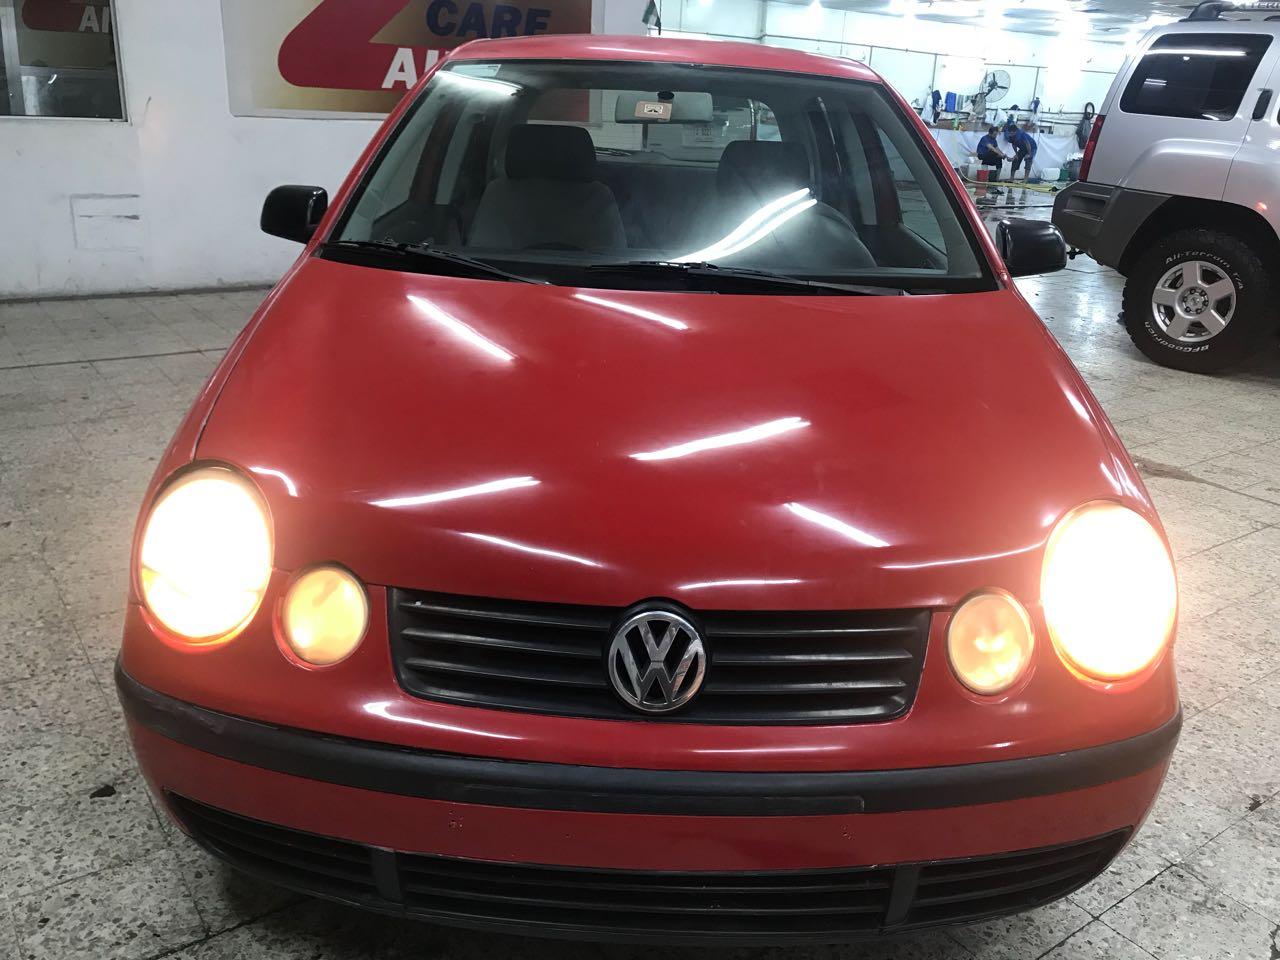 Used Volkswagen Polo 2003 Car For Sale In Dubai 753394